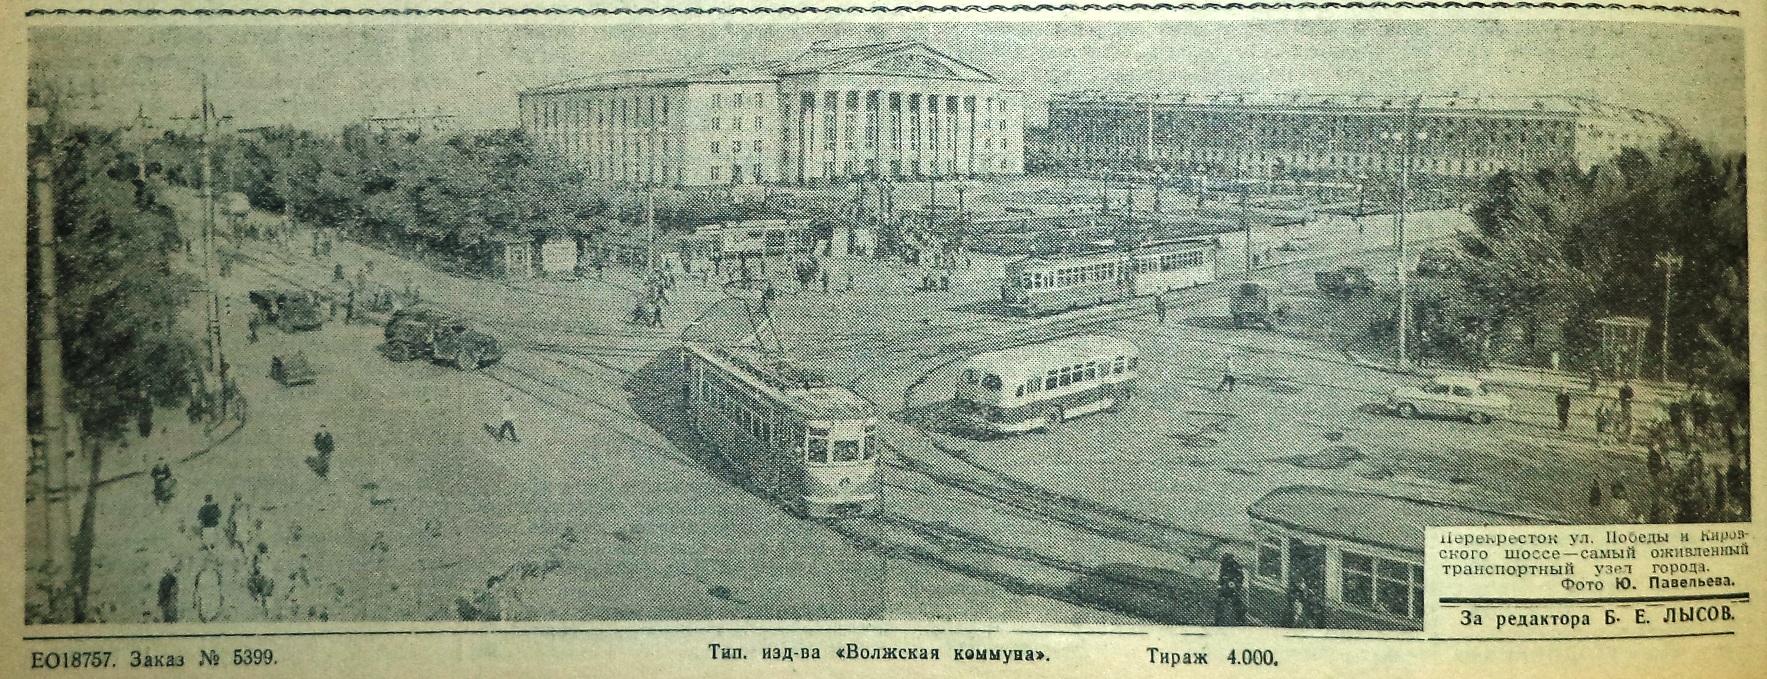 Кирова-ФОТО-43-Автотранспортник-1962-19 октября